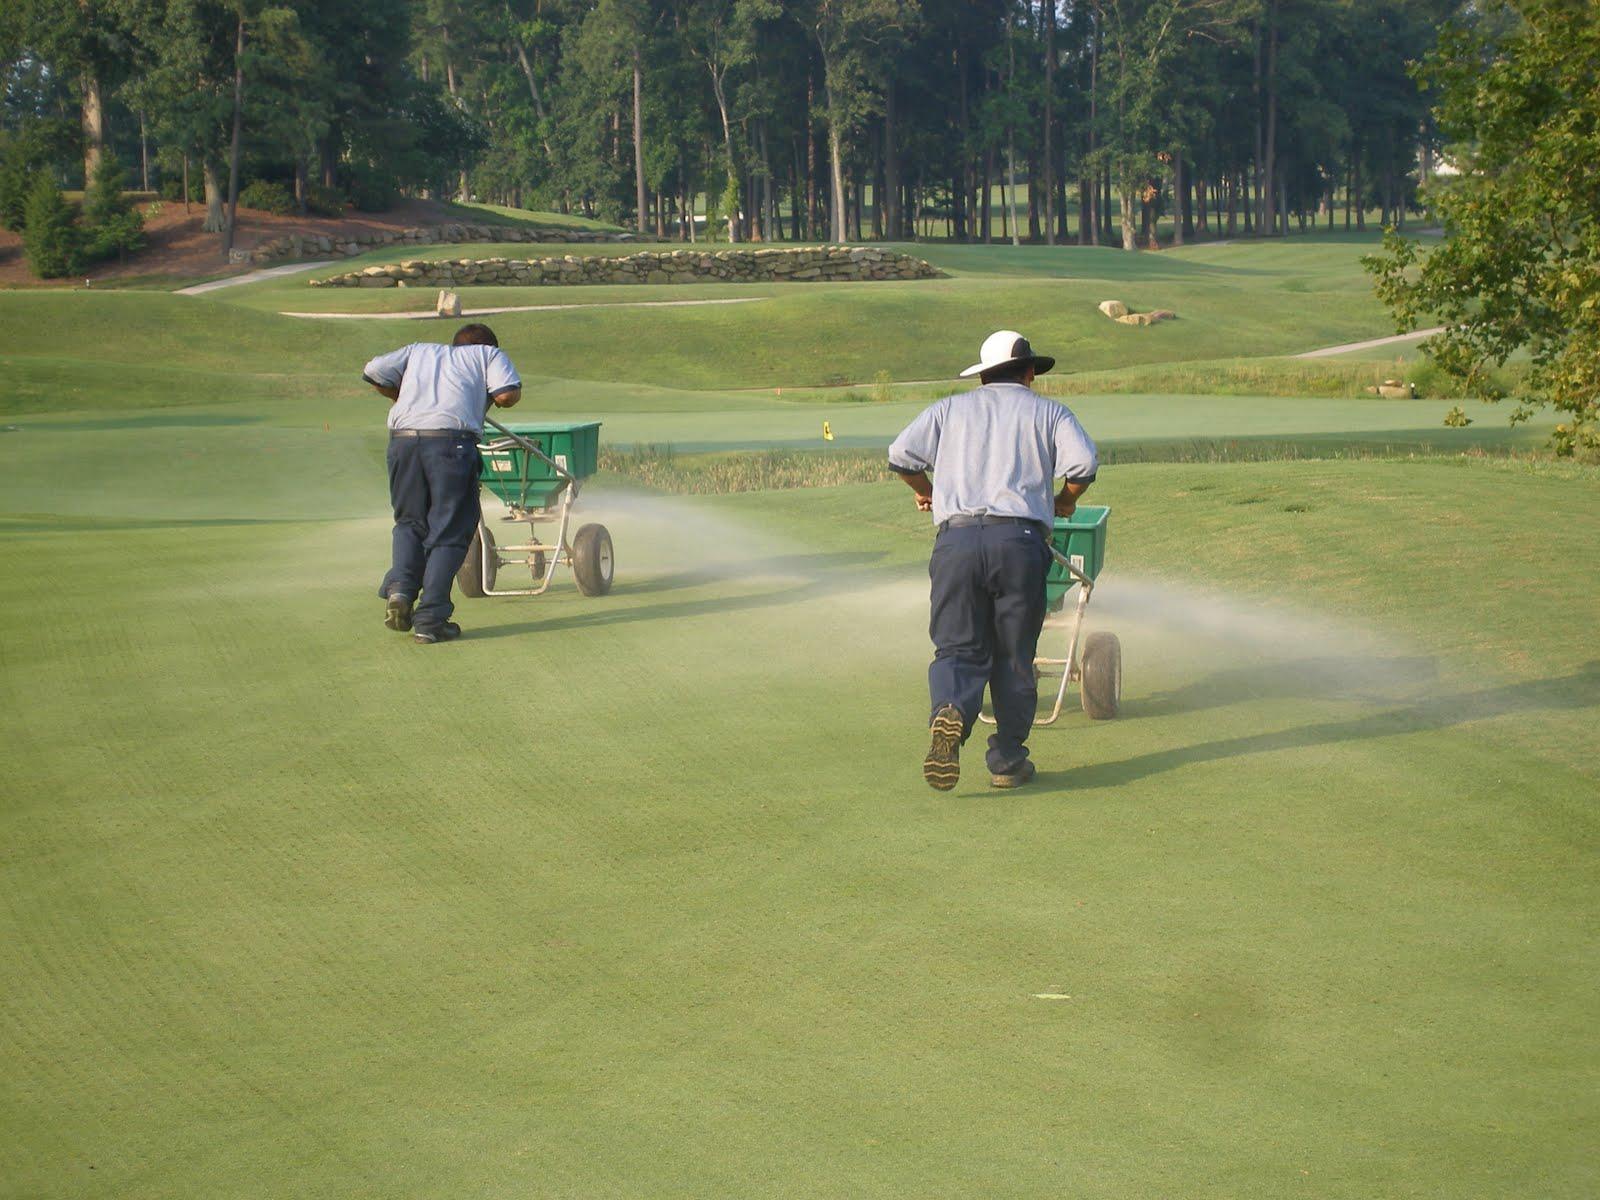 Golf Course Maintenance - Topdressing Greens